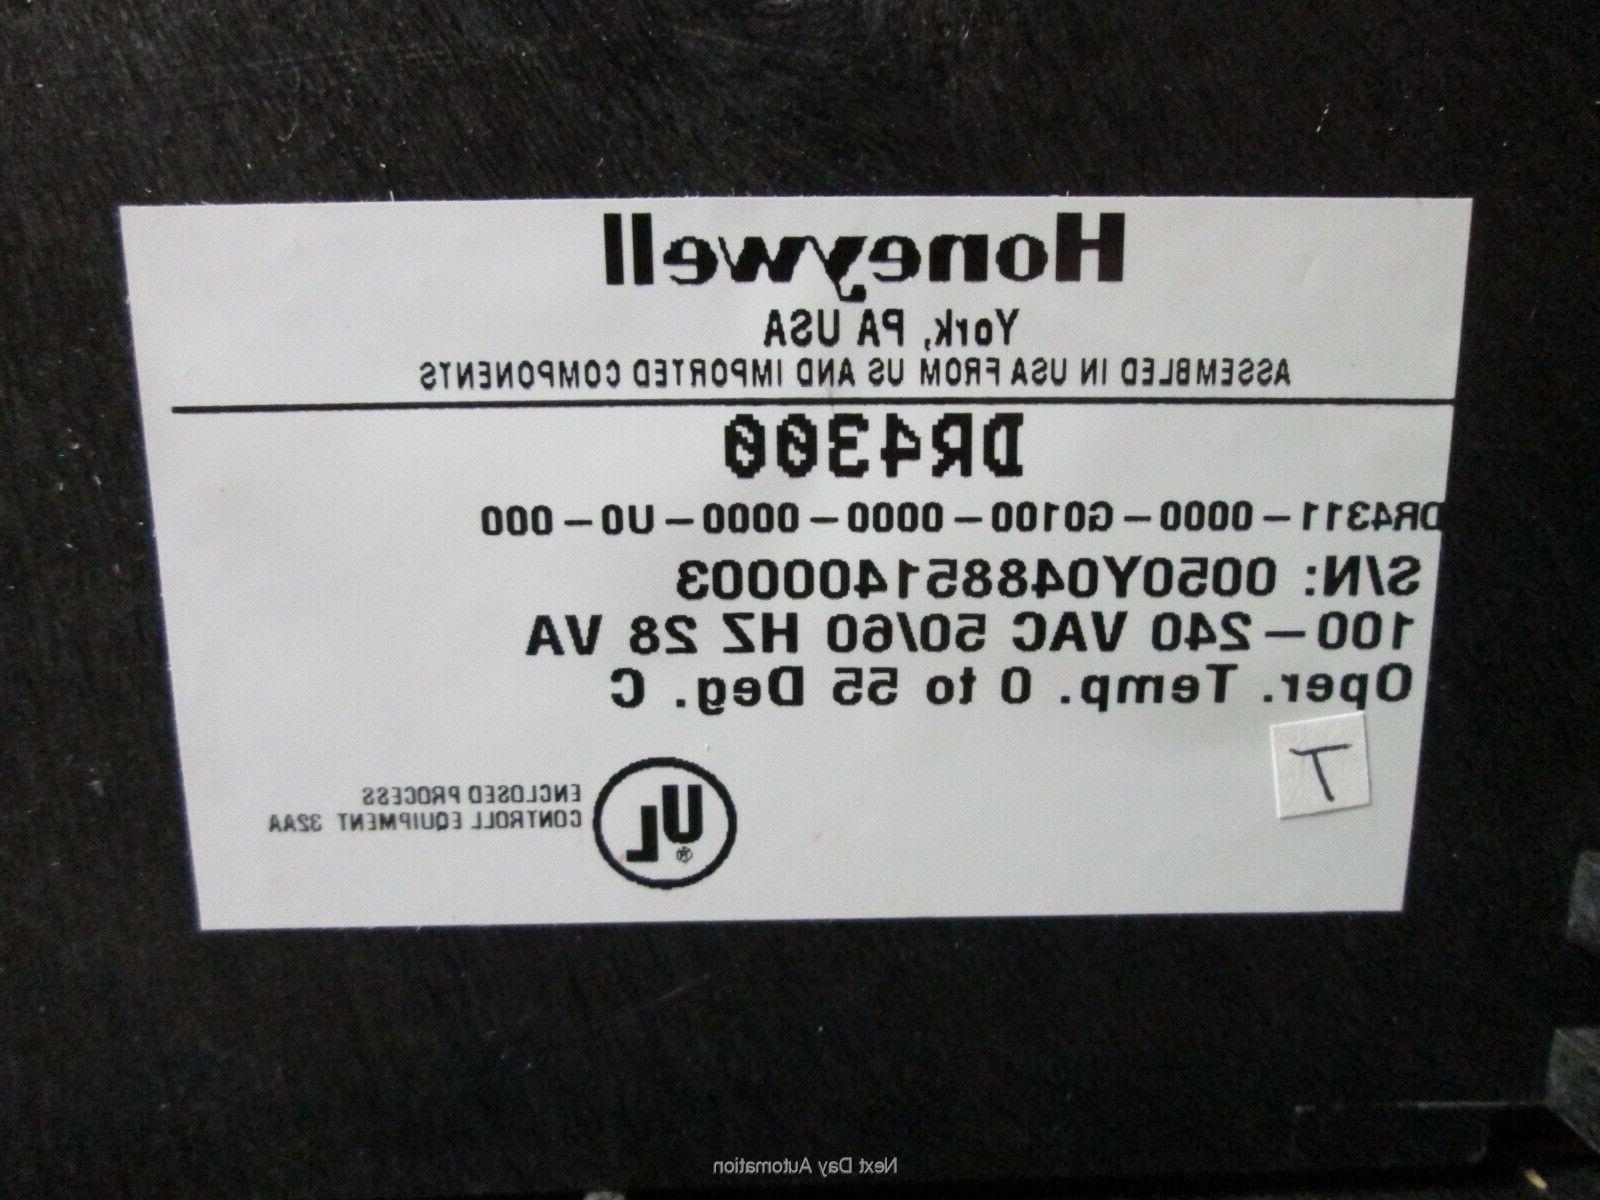 Kelvinator Scientific UC540 Chest Freezer Tested w/ Recorder